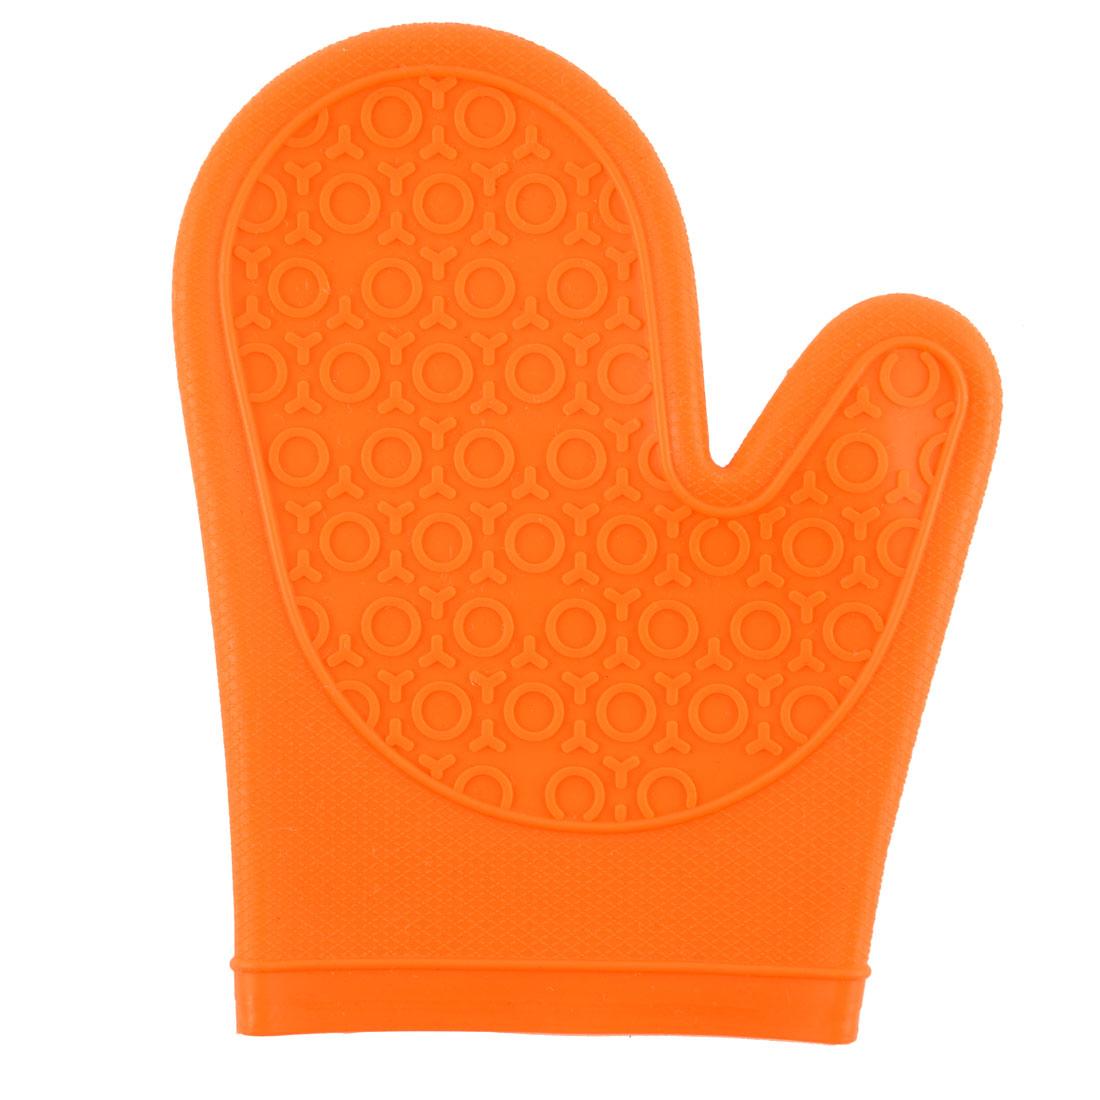 Household Silicone Heat Insulated Pot Holder Oven Mitt Glove Single Orange